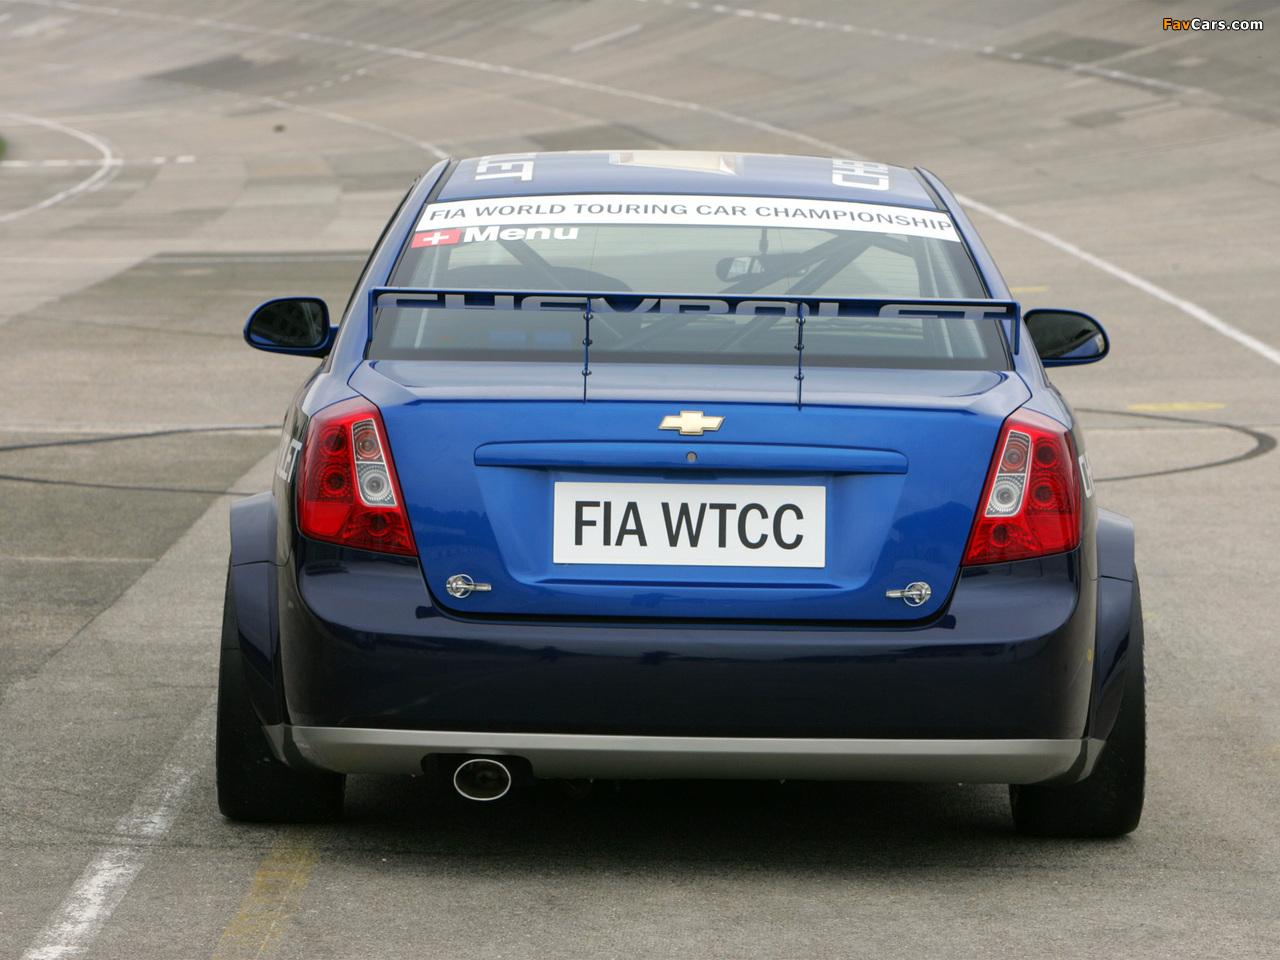 Chevrolet Lacetti WTCC 2005 pictures (1280 x 960)